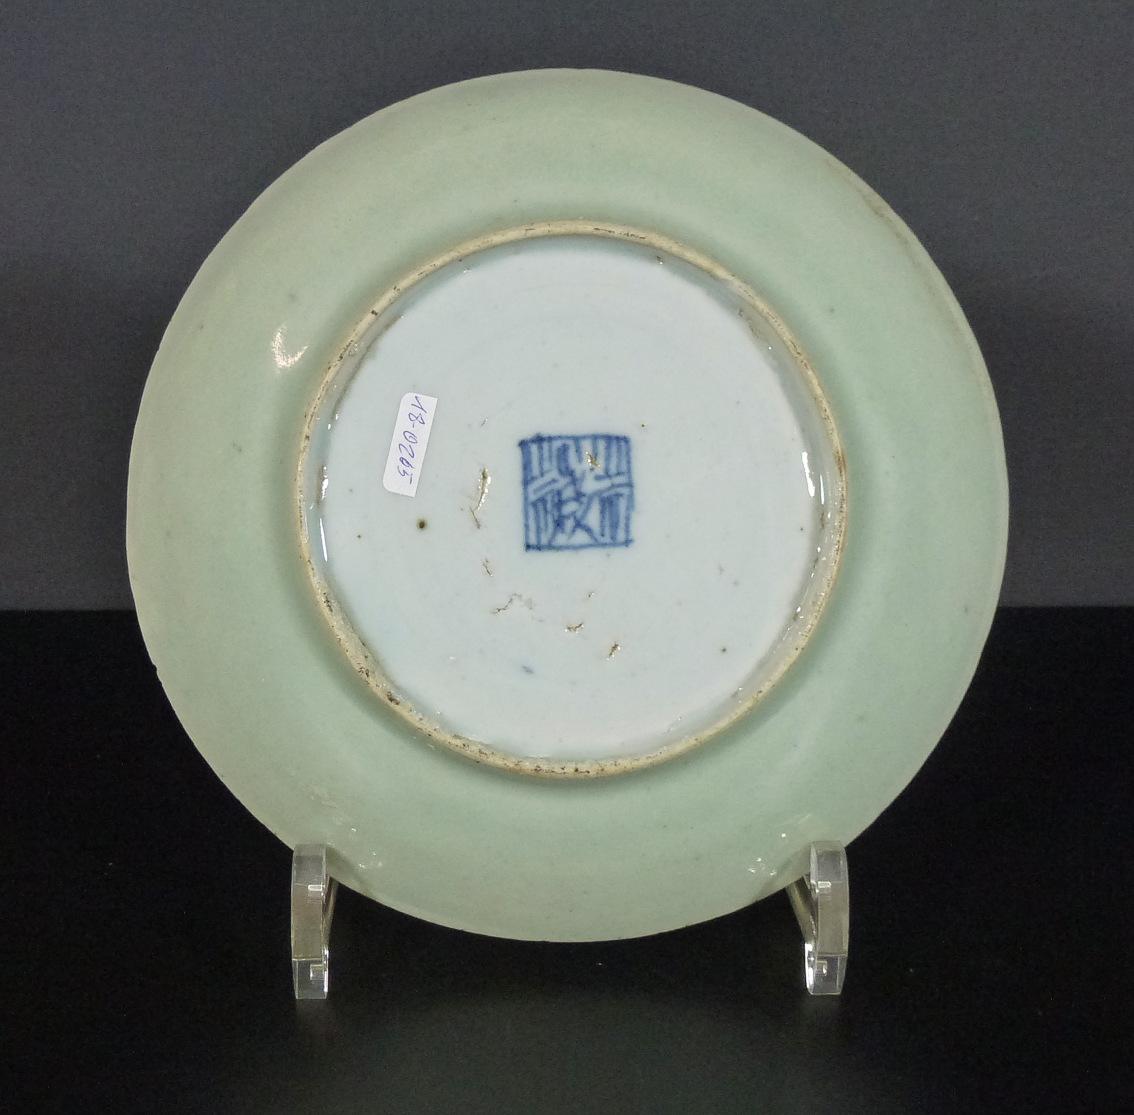 Jiaqing Mark&Period Dish - Celadon